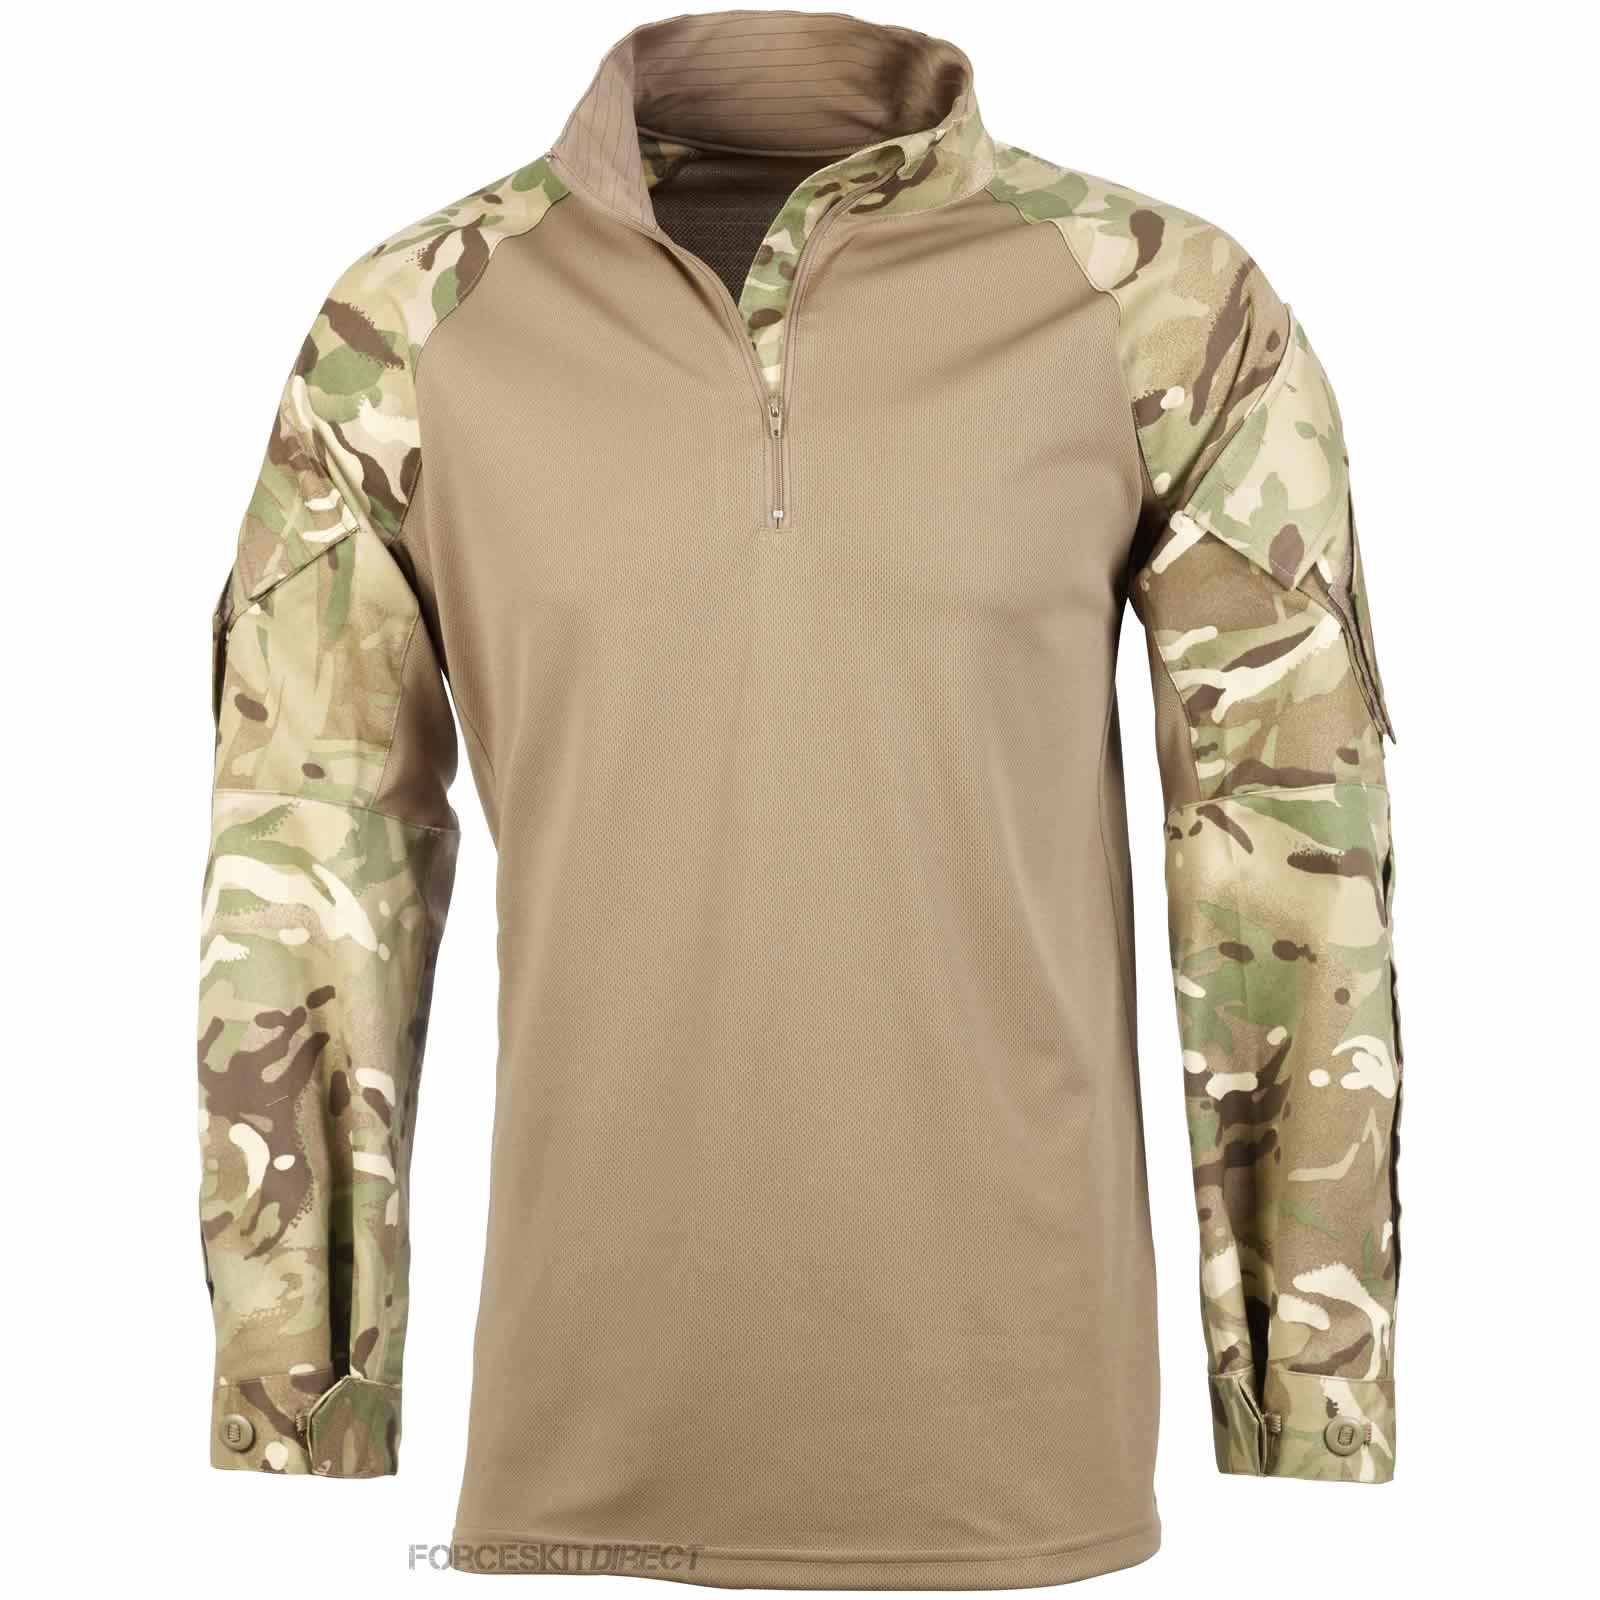 British Army Surplus MTP UBACS Shirt Under Body Armour ...